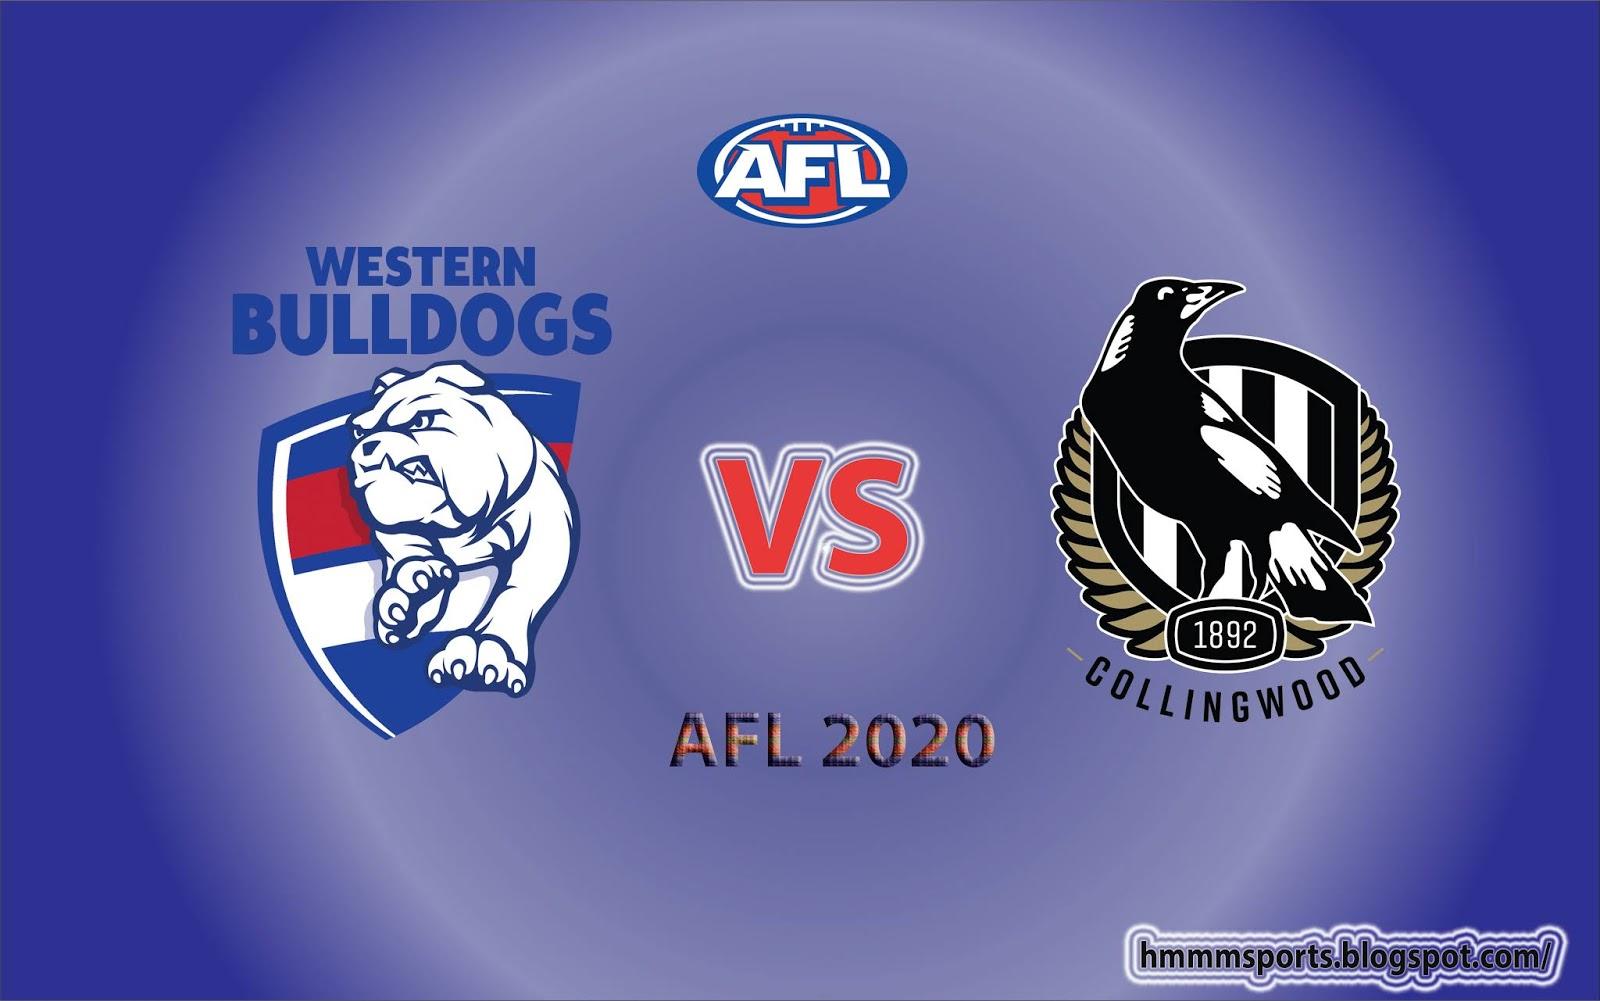 Western Bulldogs Vs Collingwood Preview Prediction Live Scores Afl 2020